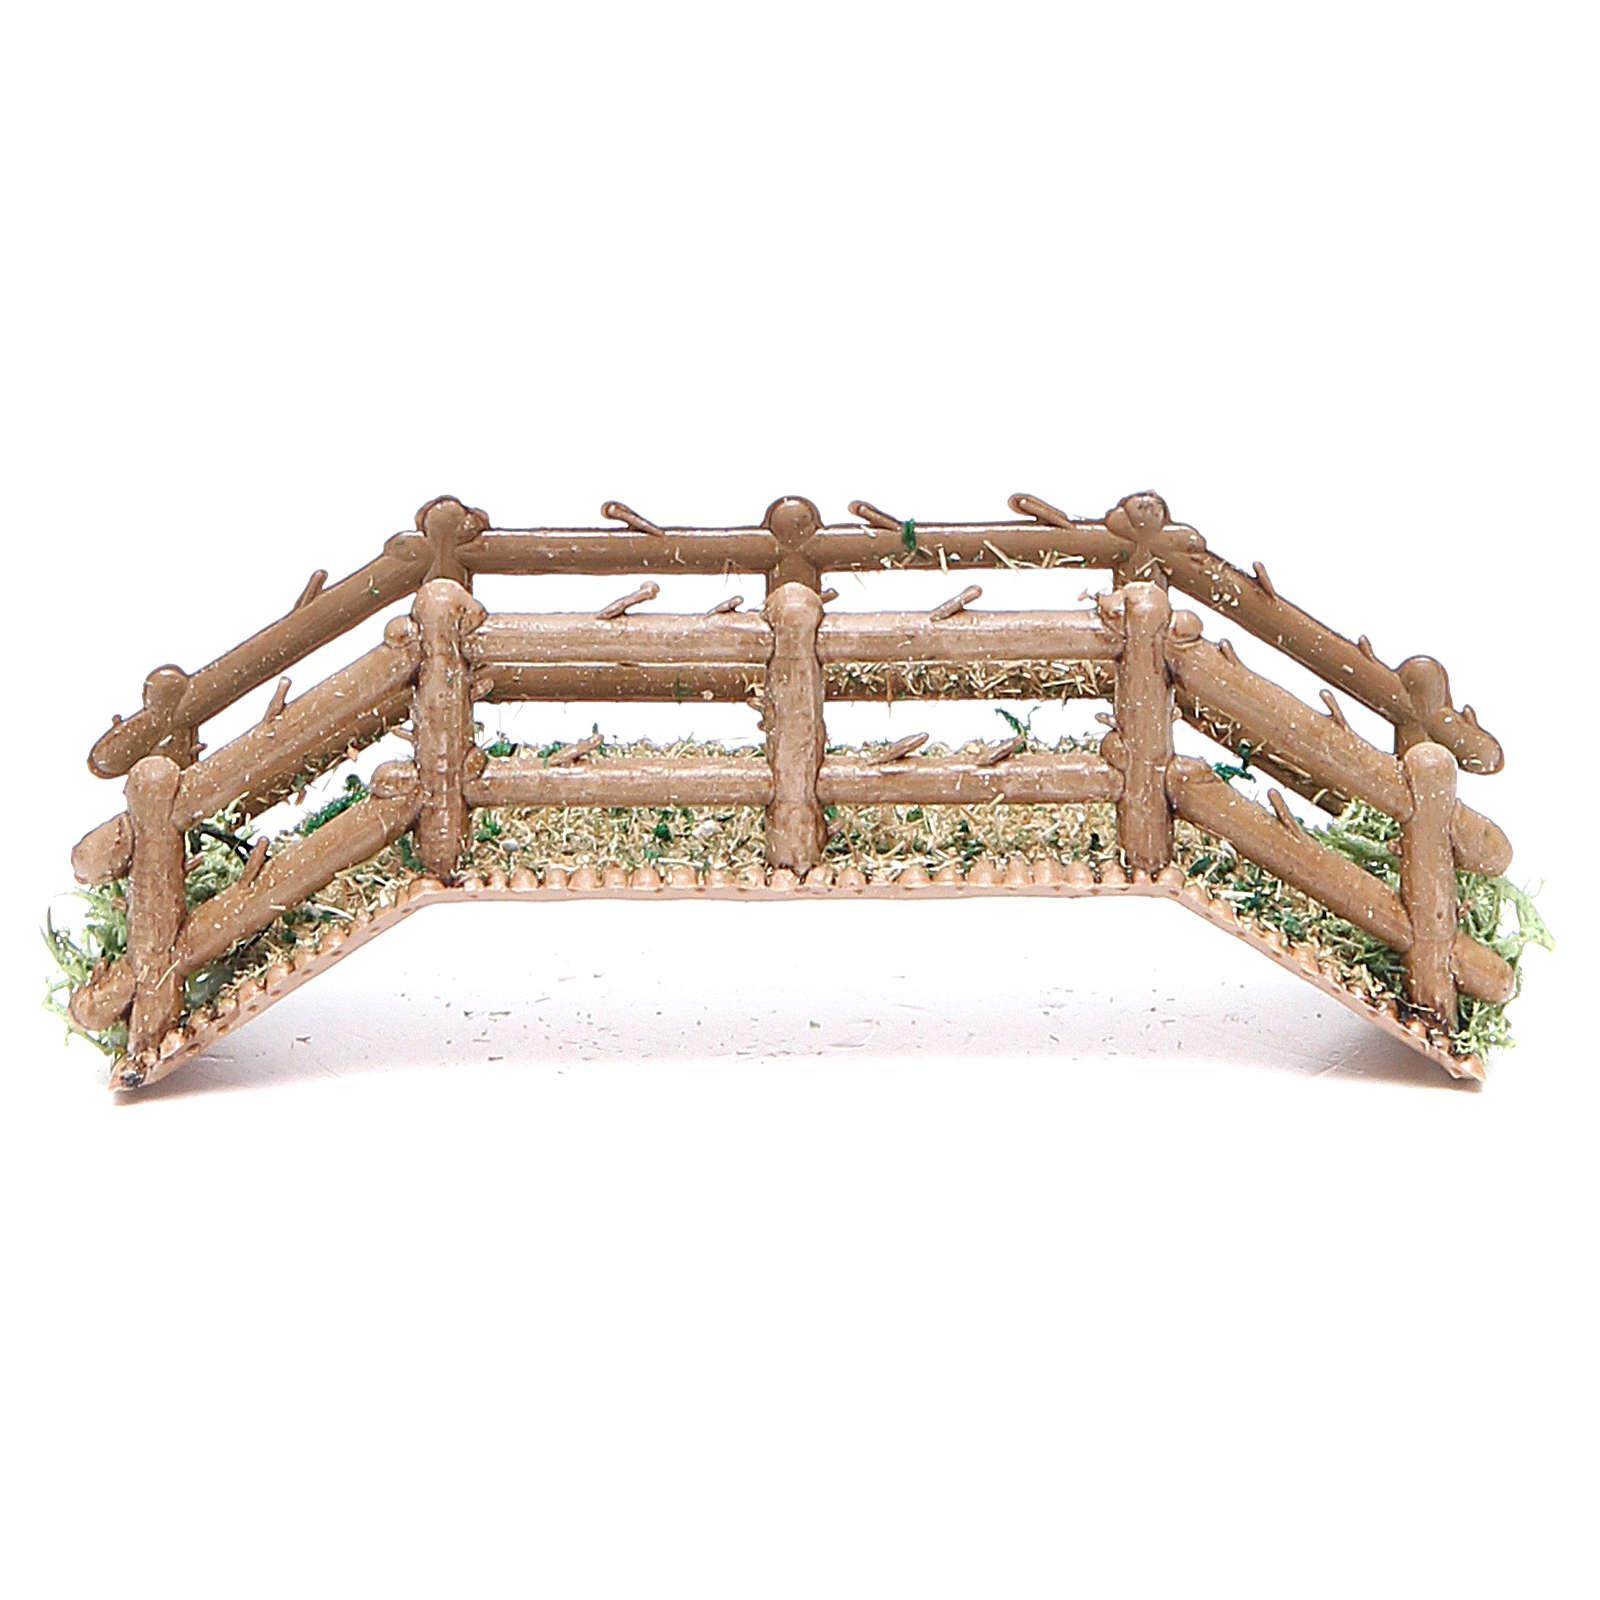 Bridge in PVC for nativities measuring 12x4x3cm 4